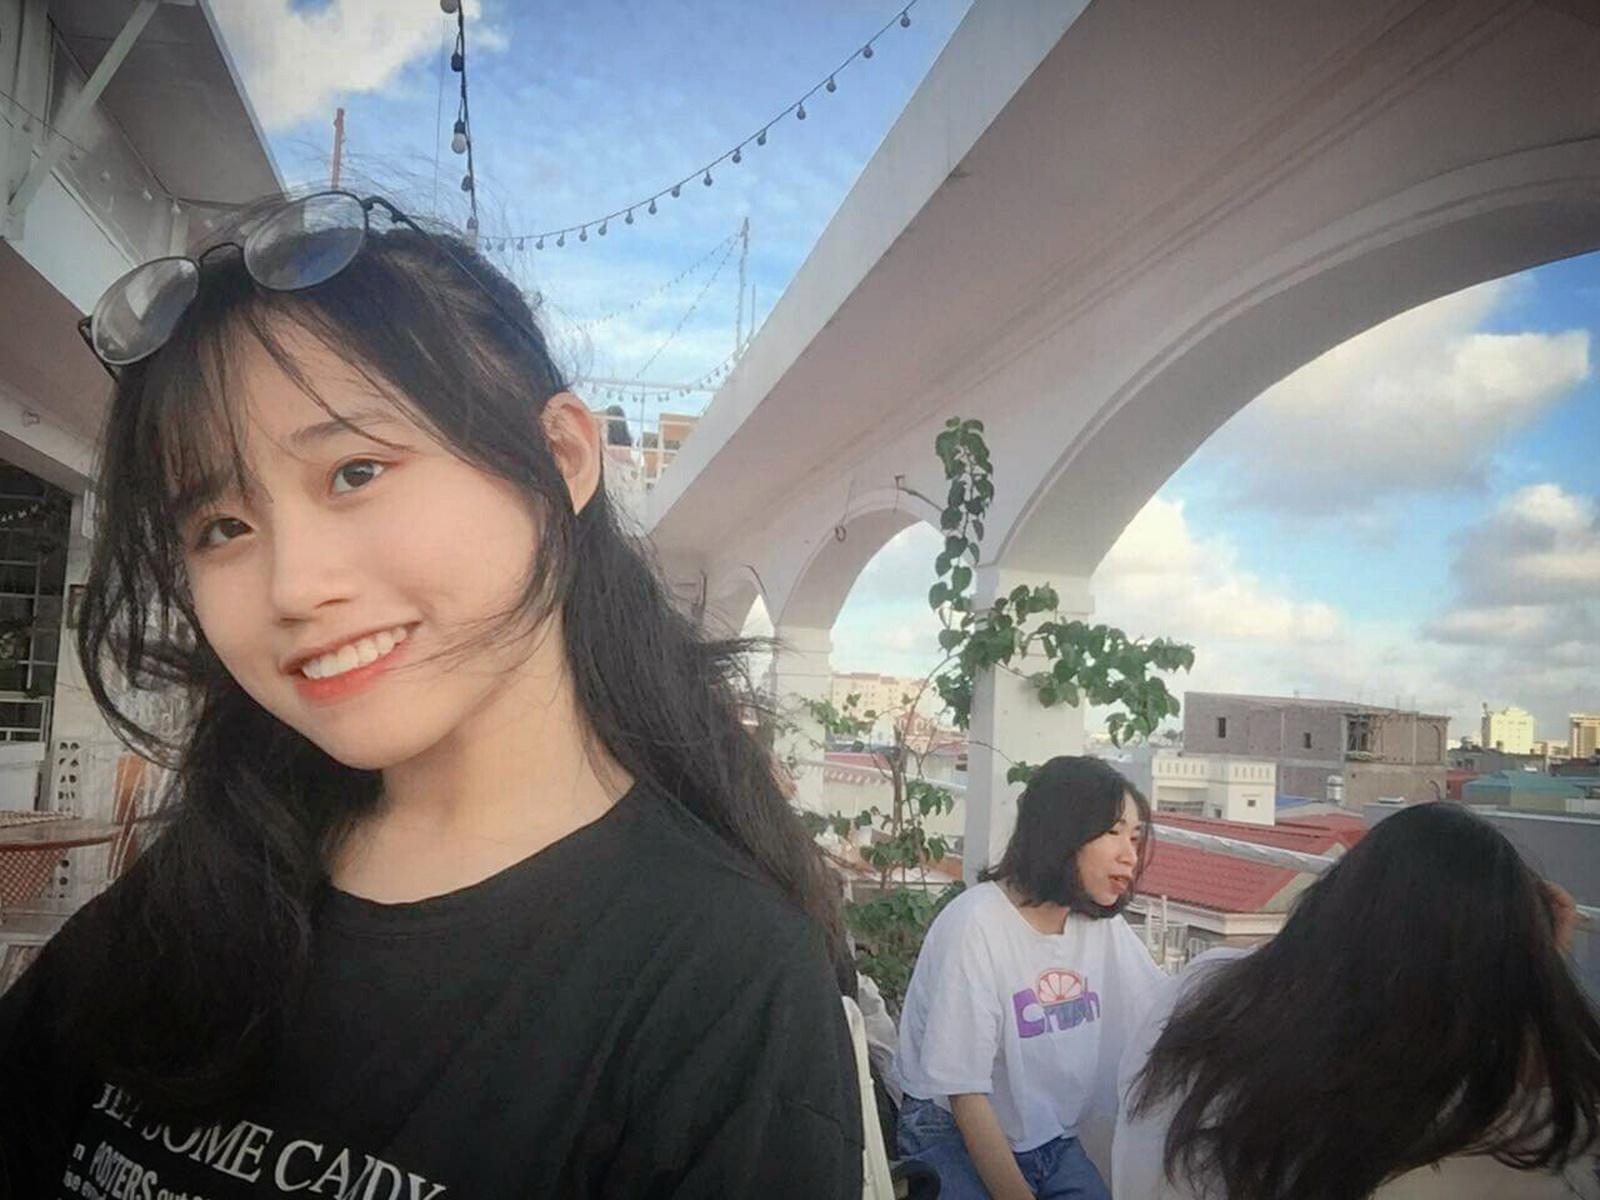 Thu khoa khoi C cua Hai Phong anh 2